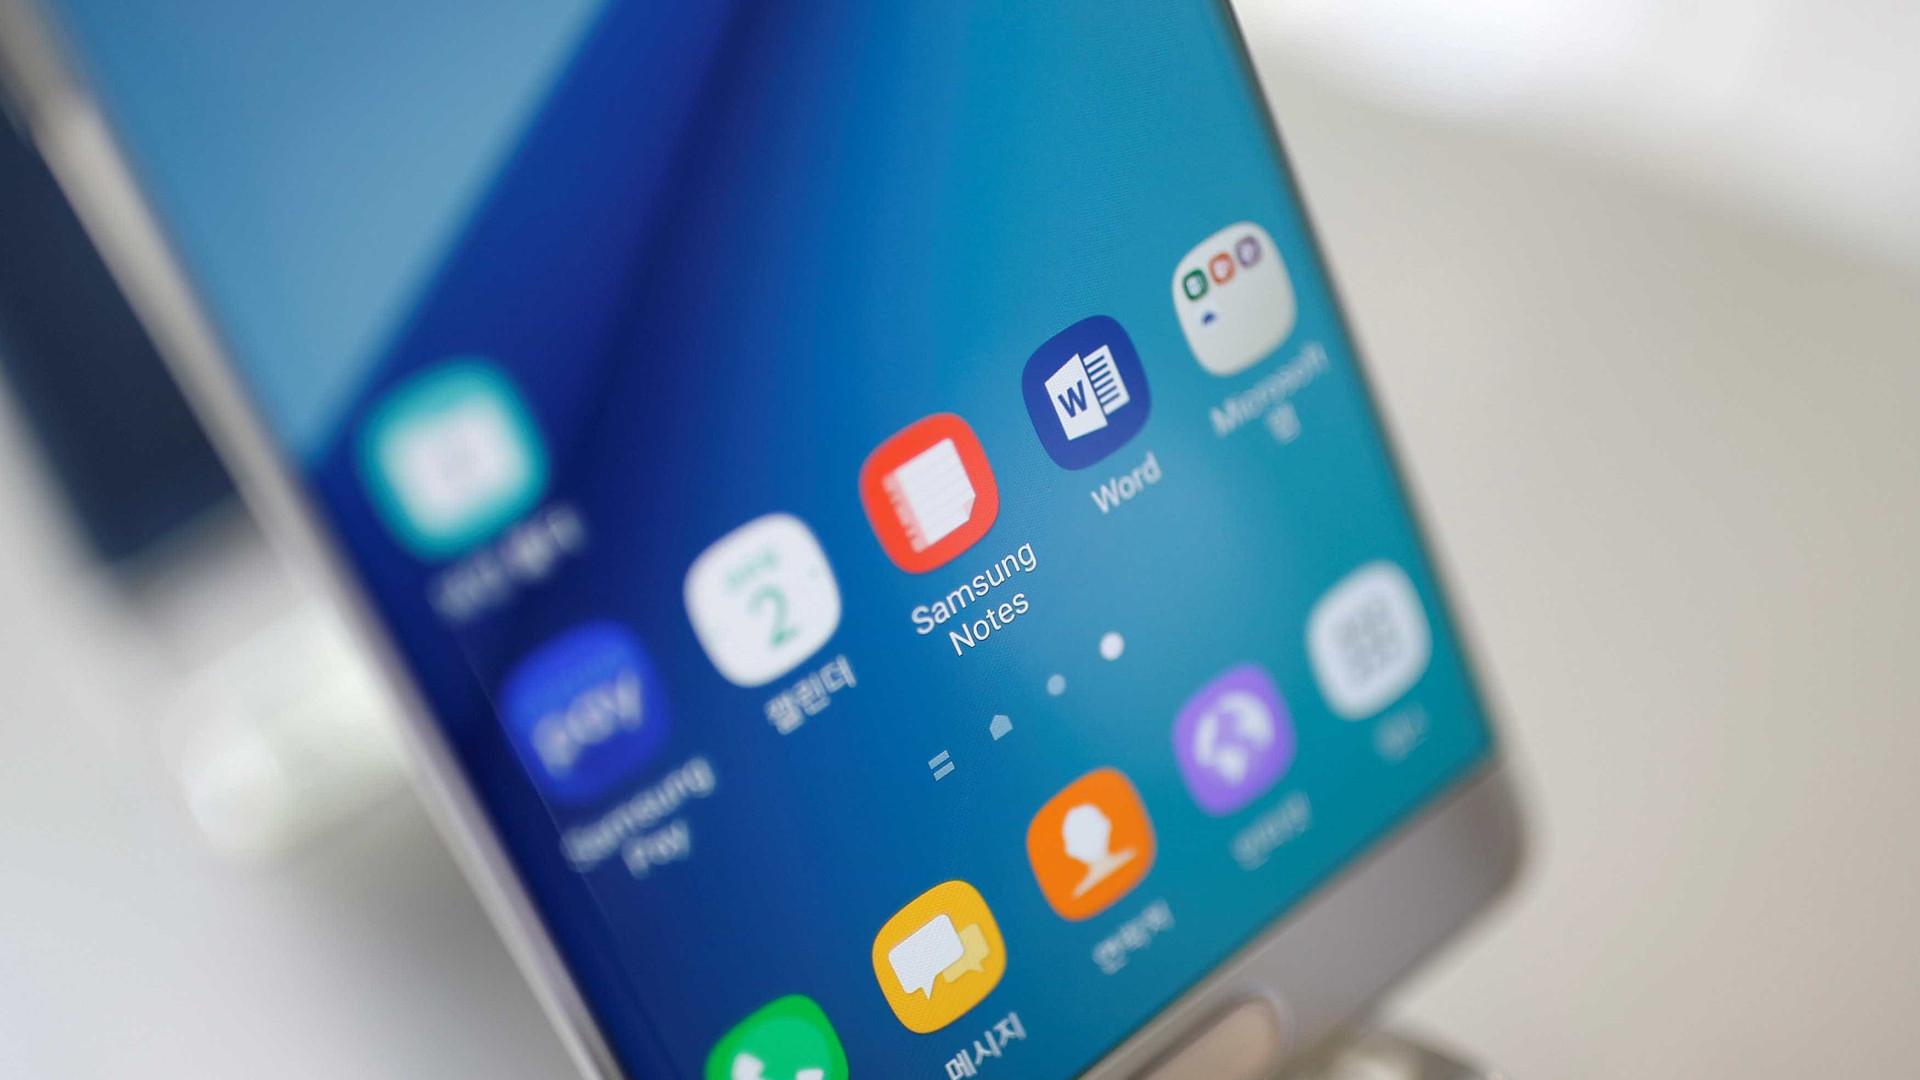 Grupo de sul-coreanos vai processar Samsung por causa do Galaxy Note 7